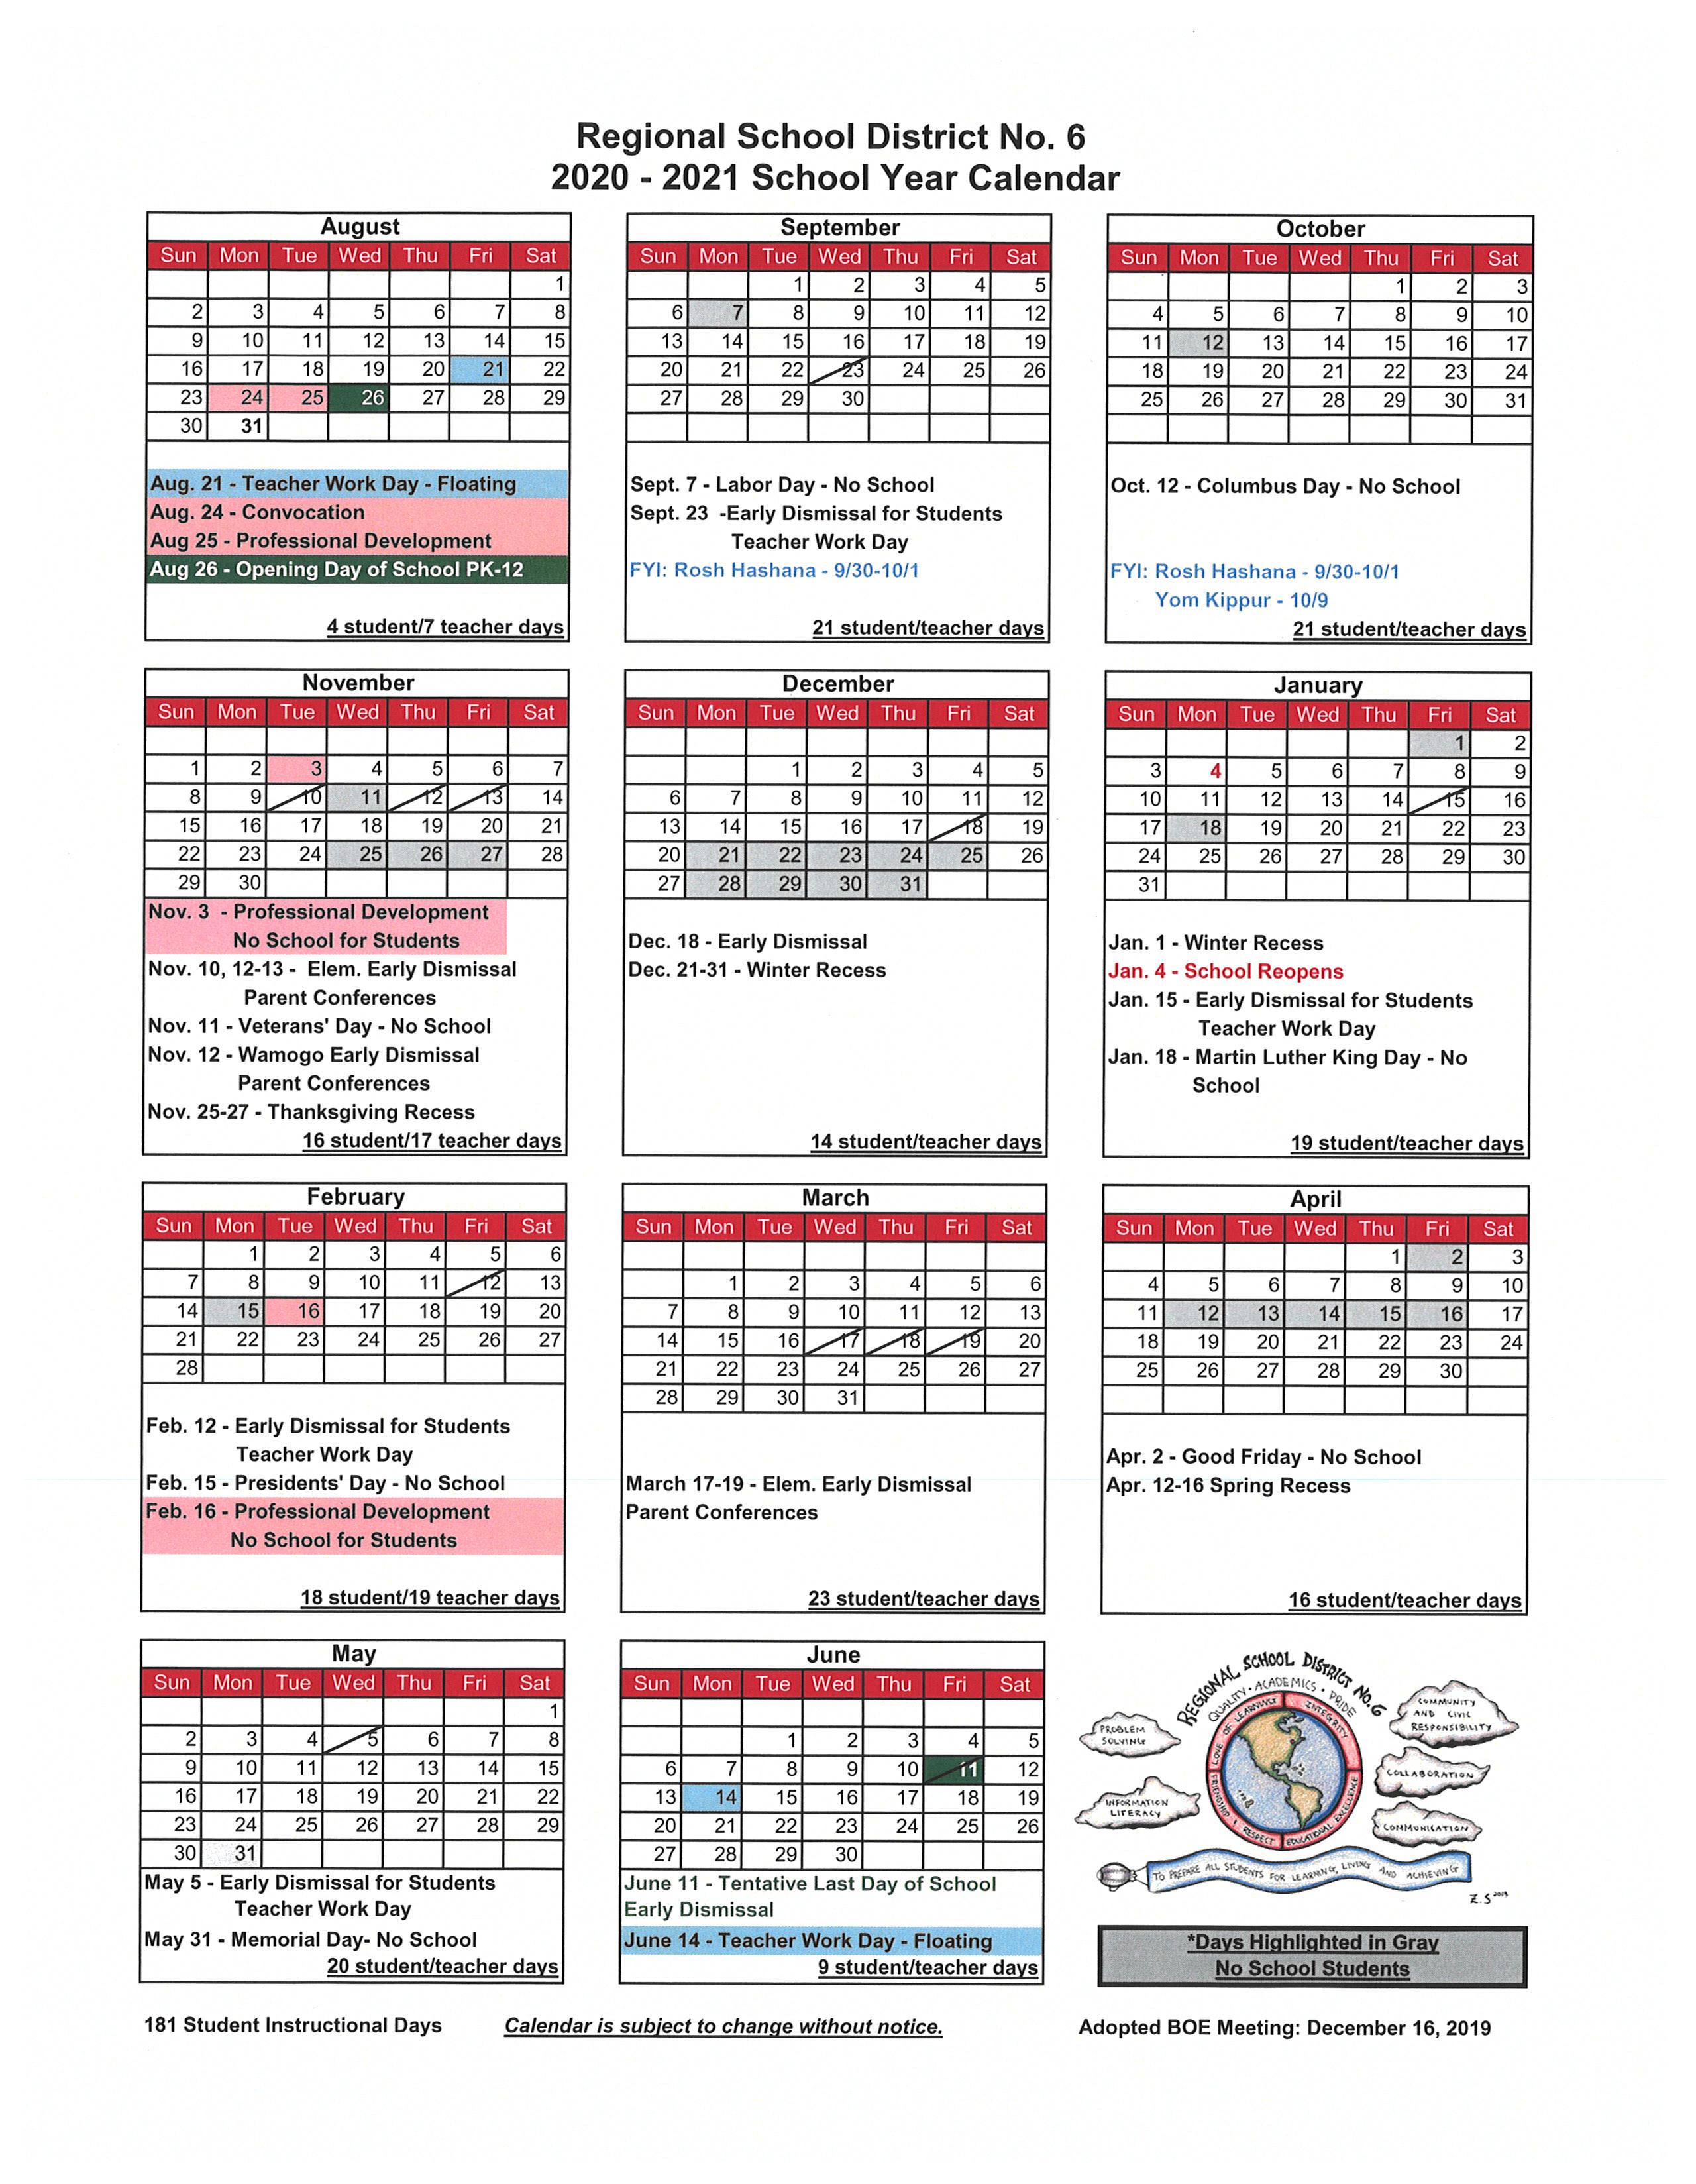 2020 2021 School Calendar - Regional School District No. 6 In Bridgewater State University Calendar 2021